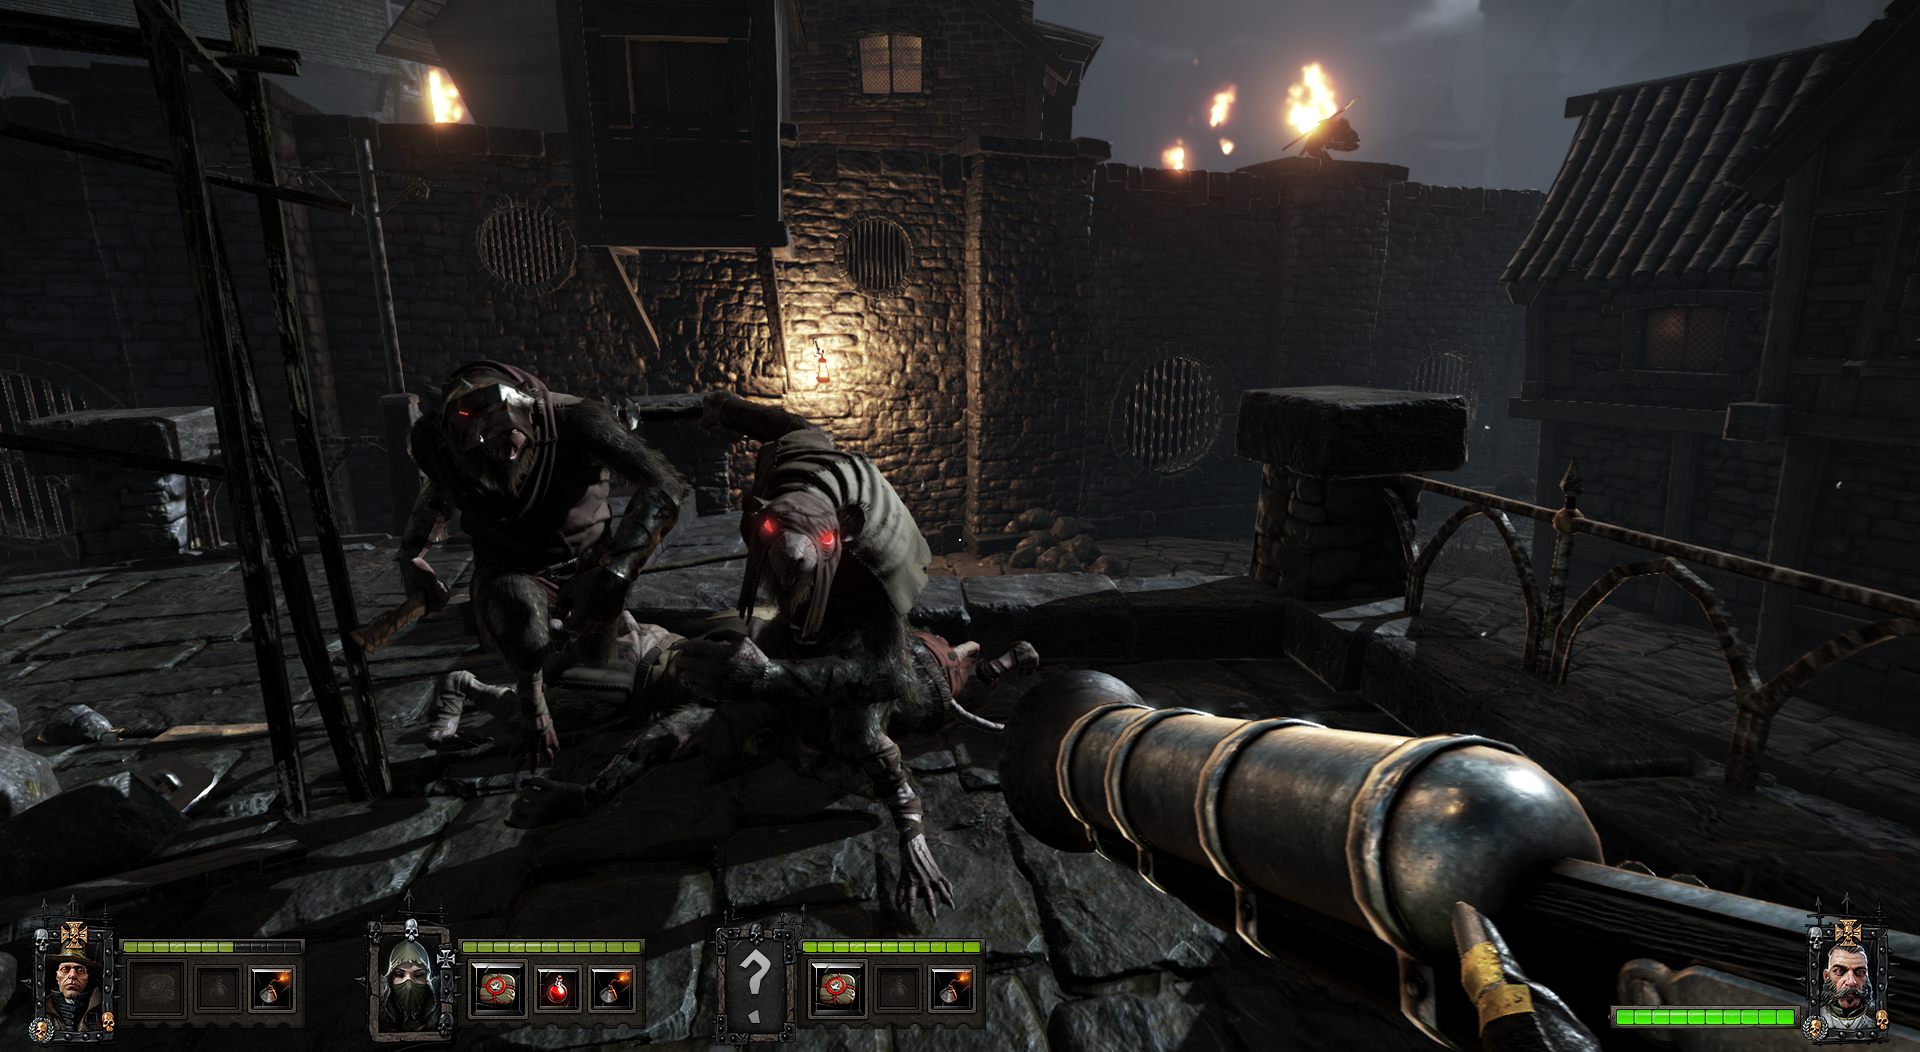 Warhammer End Of Times : Vermintides Ss_2879caf8466767f7bb32b50ec3a932f3cffc8e3f.1920x1080